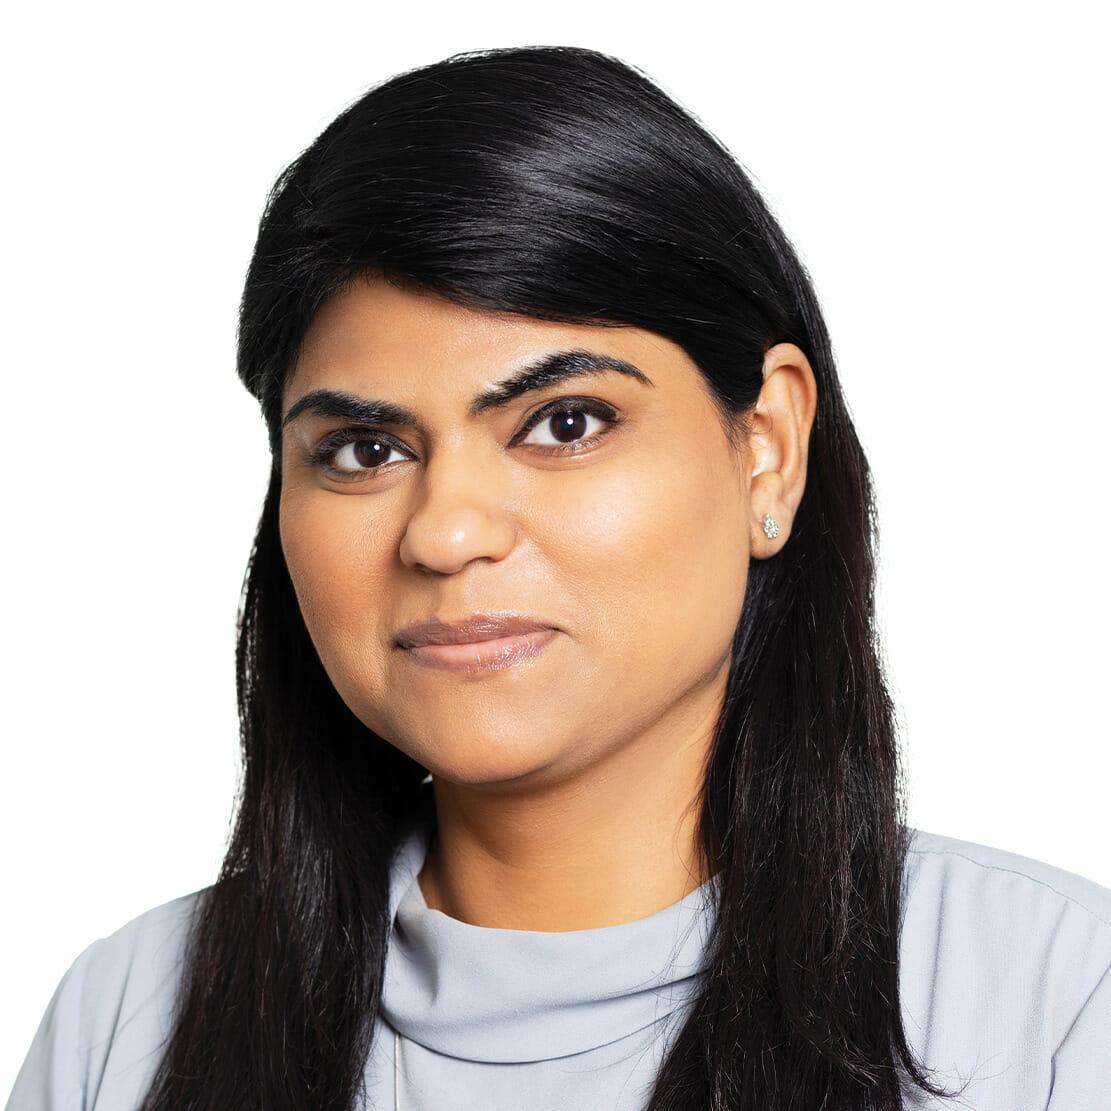 Swati Sawhney